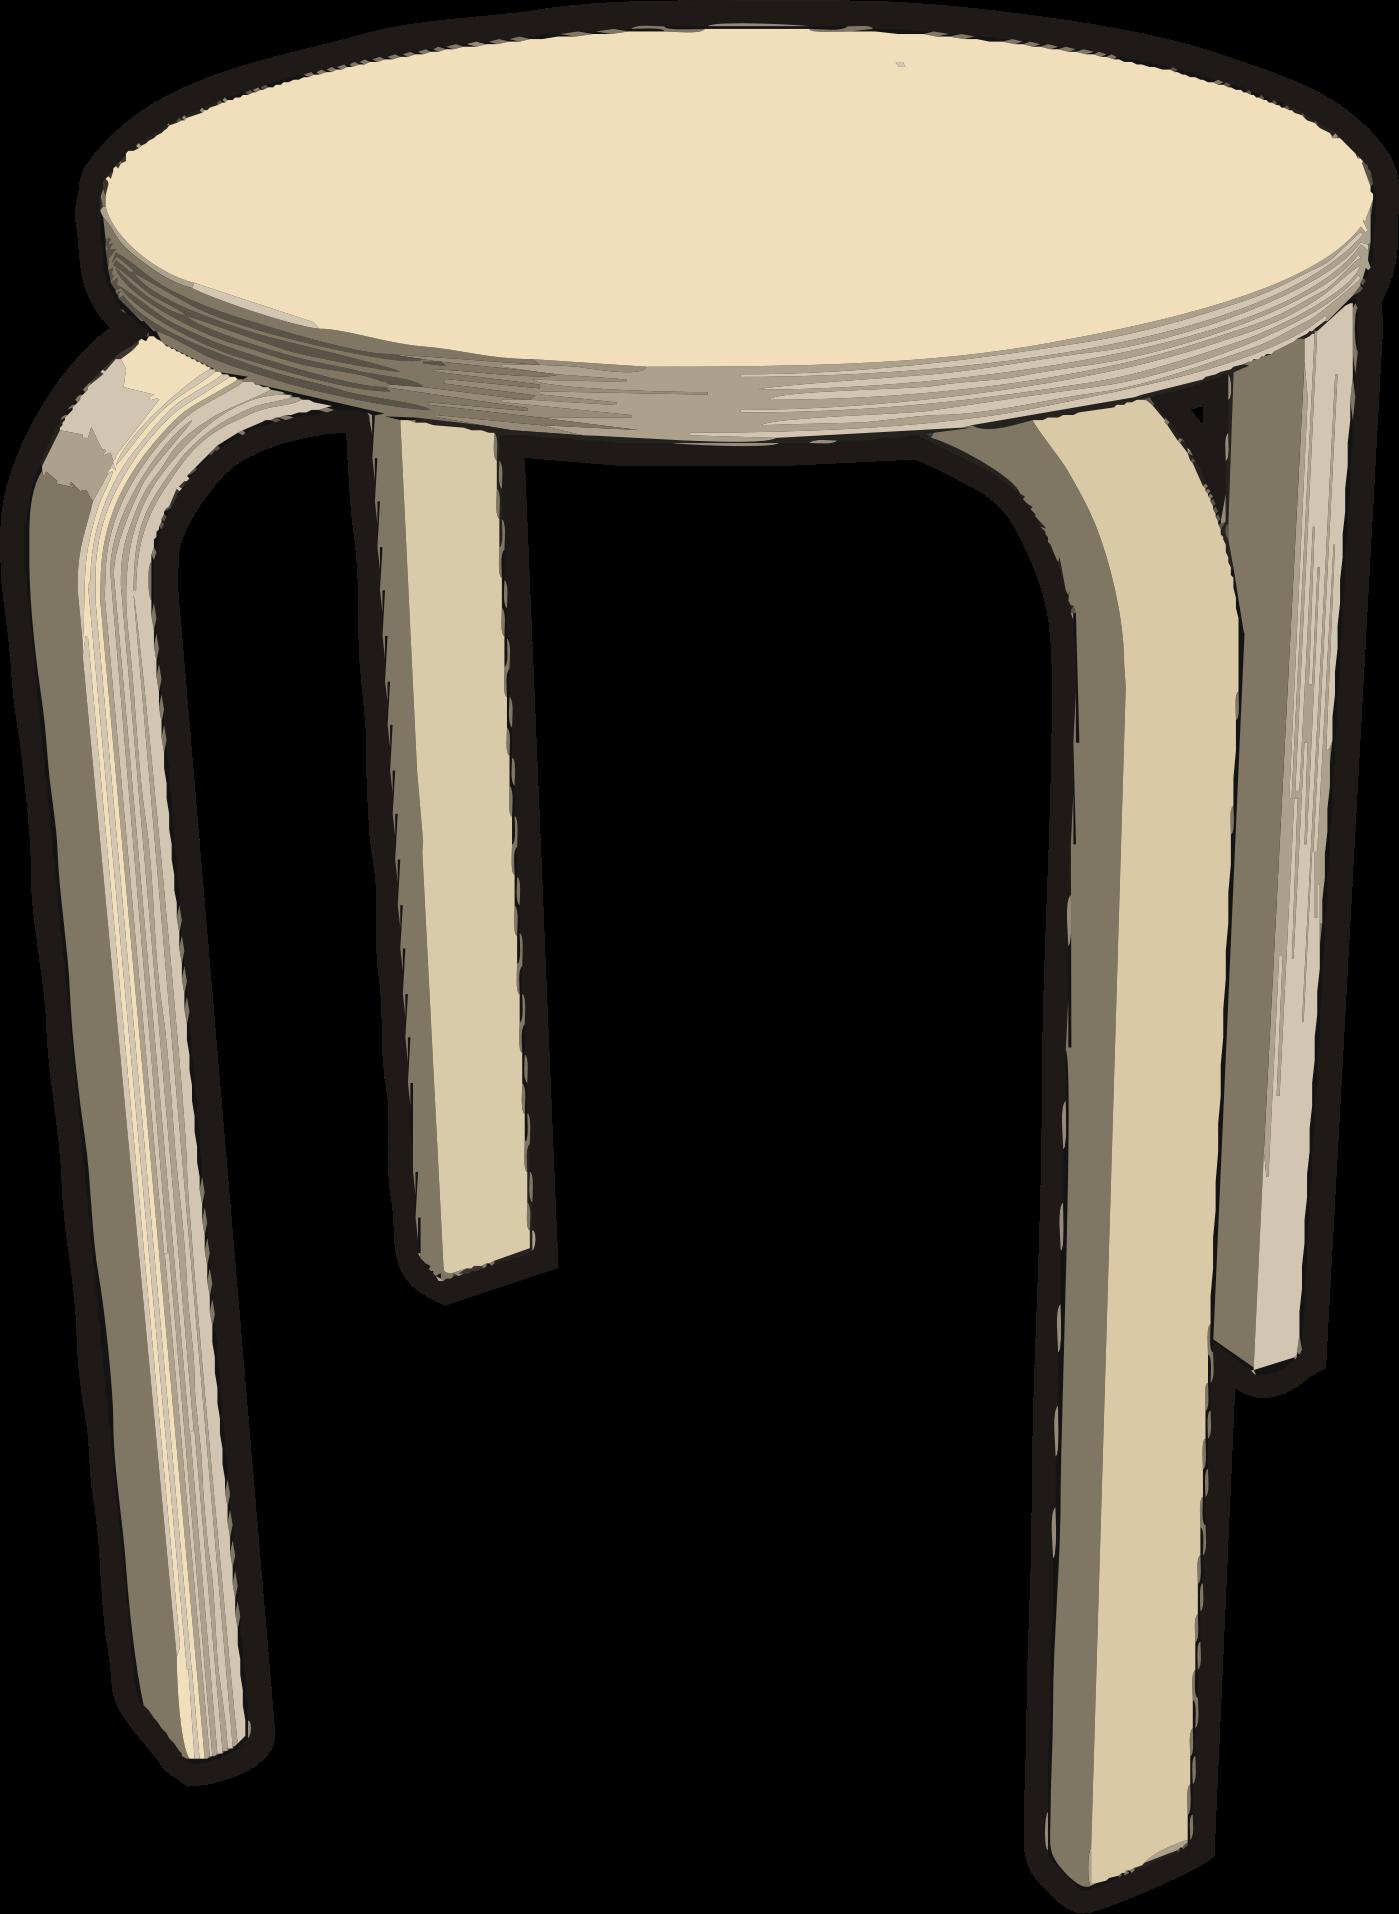 Ikea stuff frosta stool. Furniture clipart bedroom thing